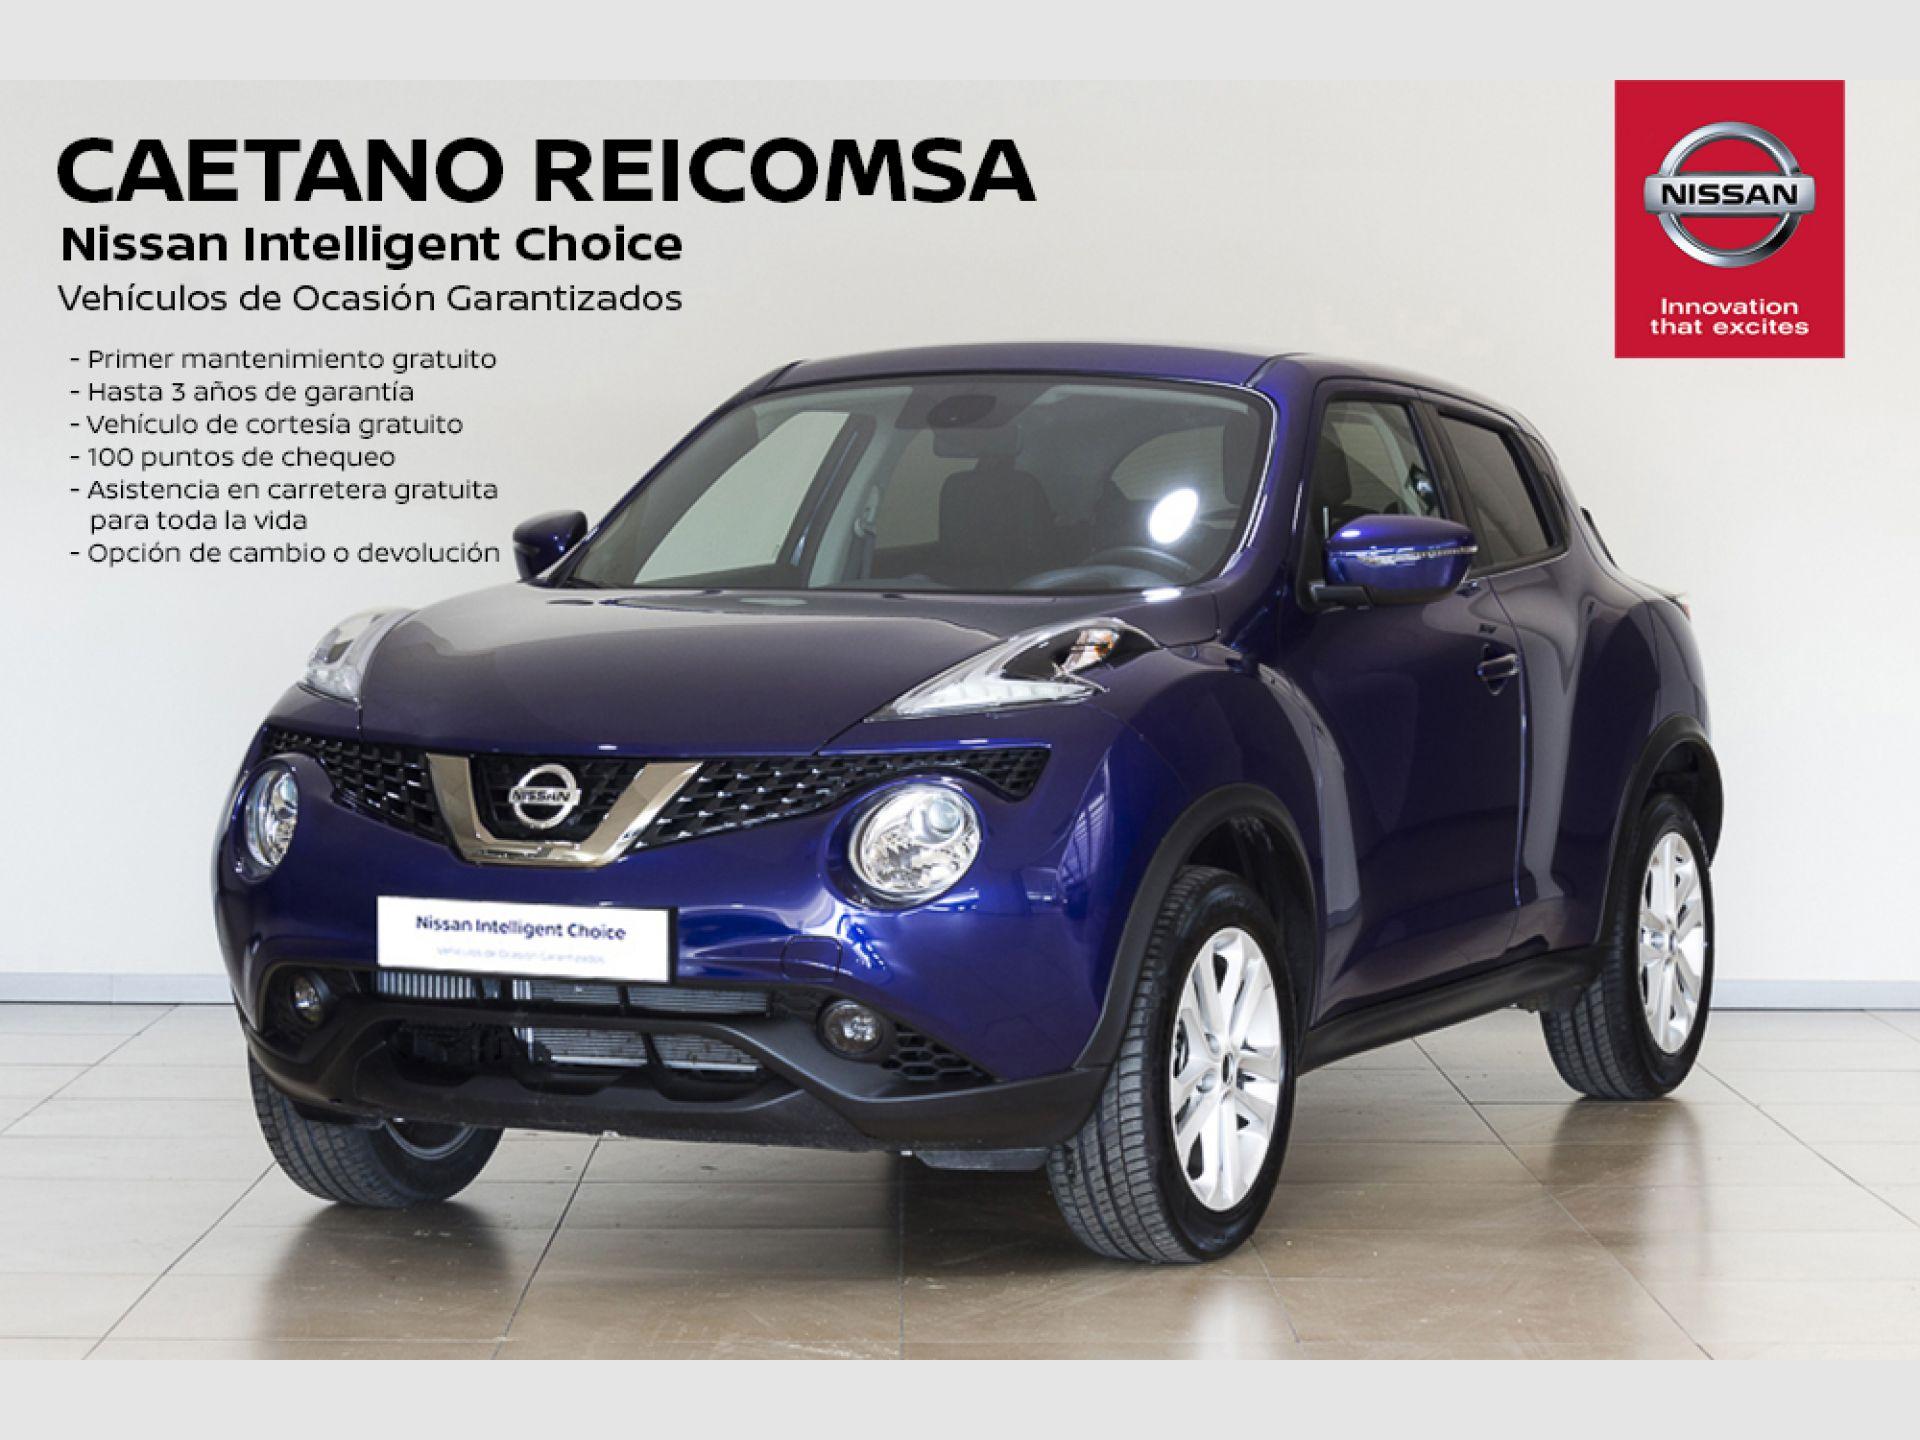 Nissan JUKE G EU6 86 kW (117 CV) XTRONIC N-CONNECTA segunda mano Madrid